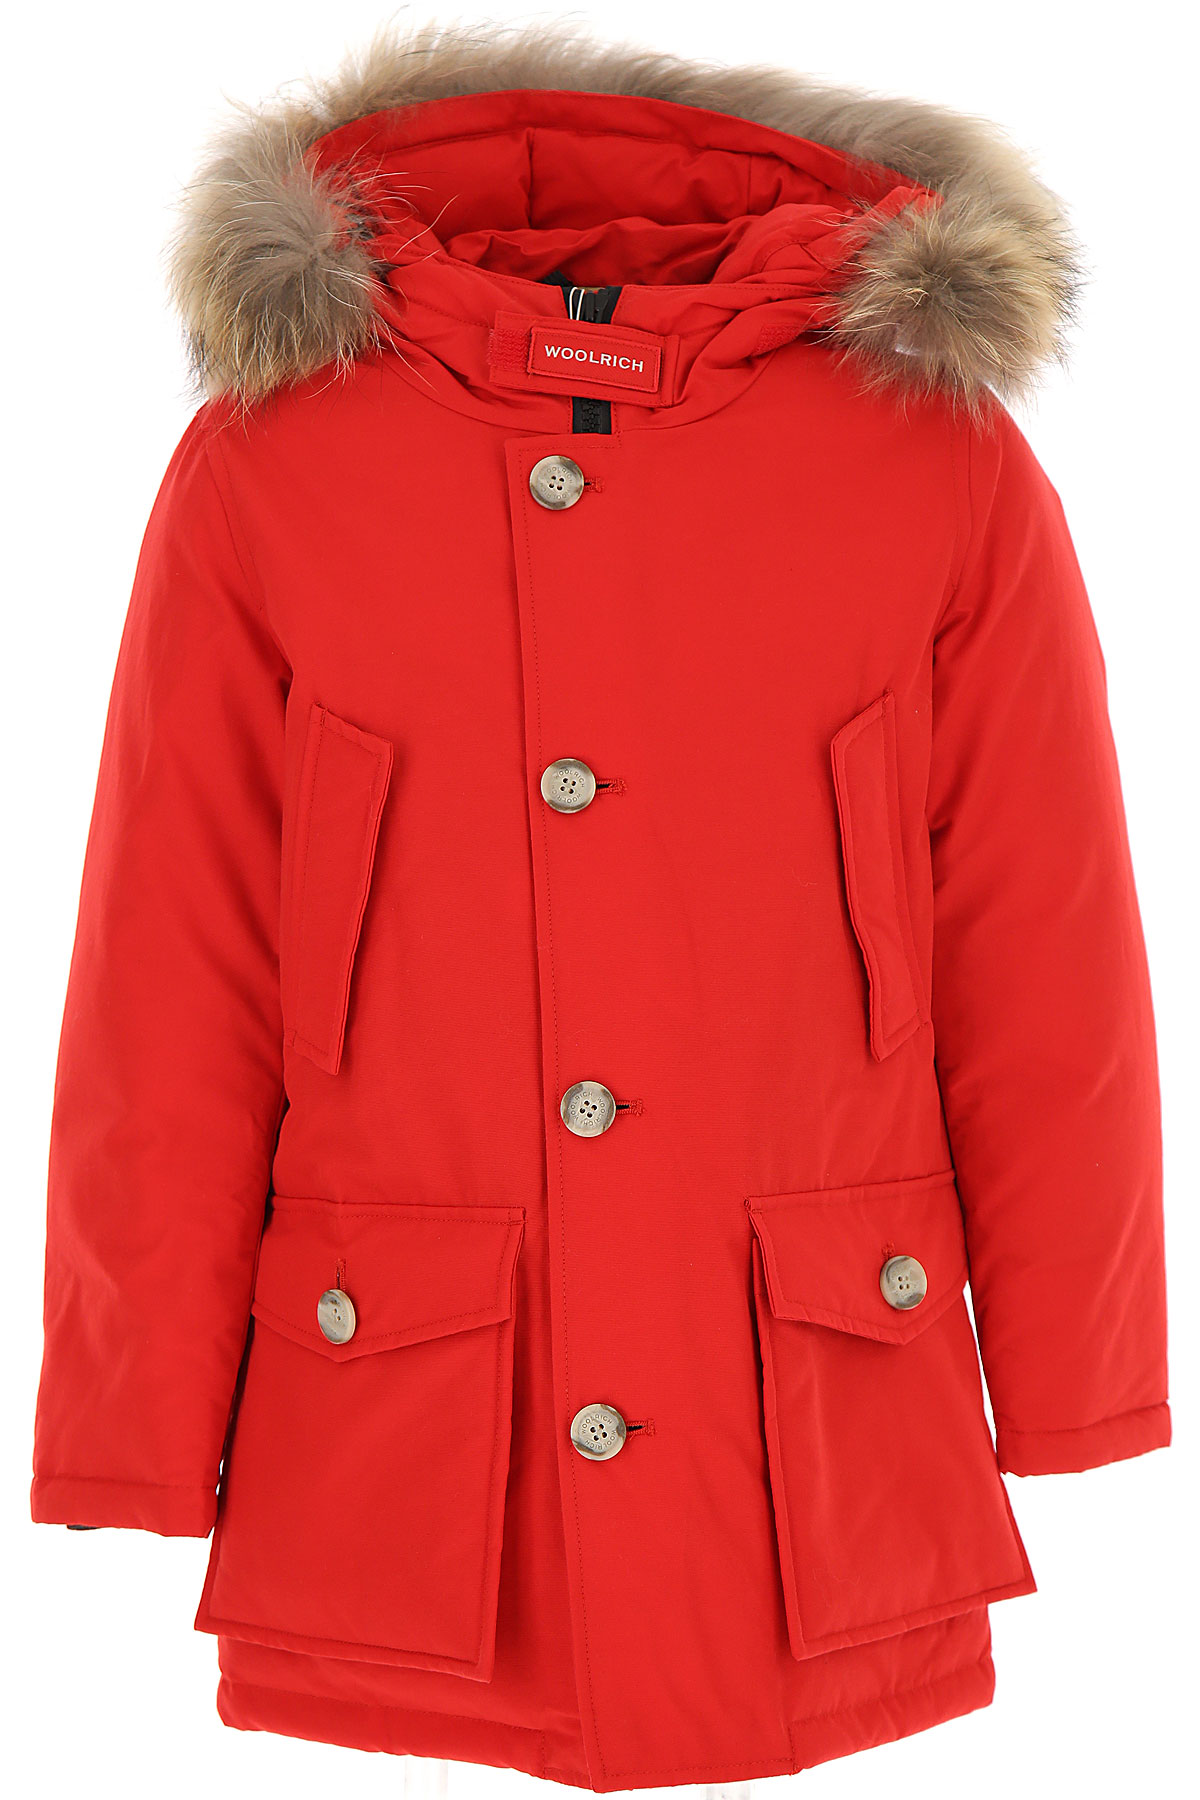 Woolrich Boys Down Jacket for Kids, Puffer Ski Jacket On Sale, Red, Cotton, 2019, 16Y 6Y 8Y